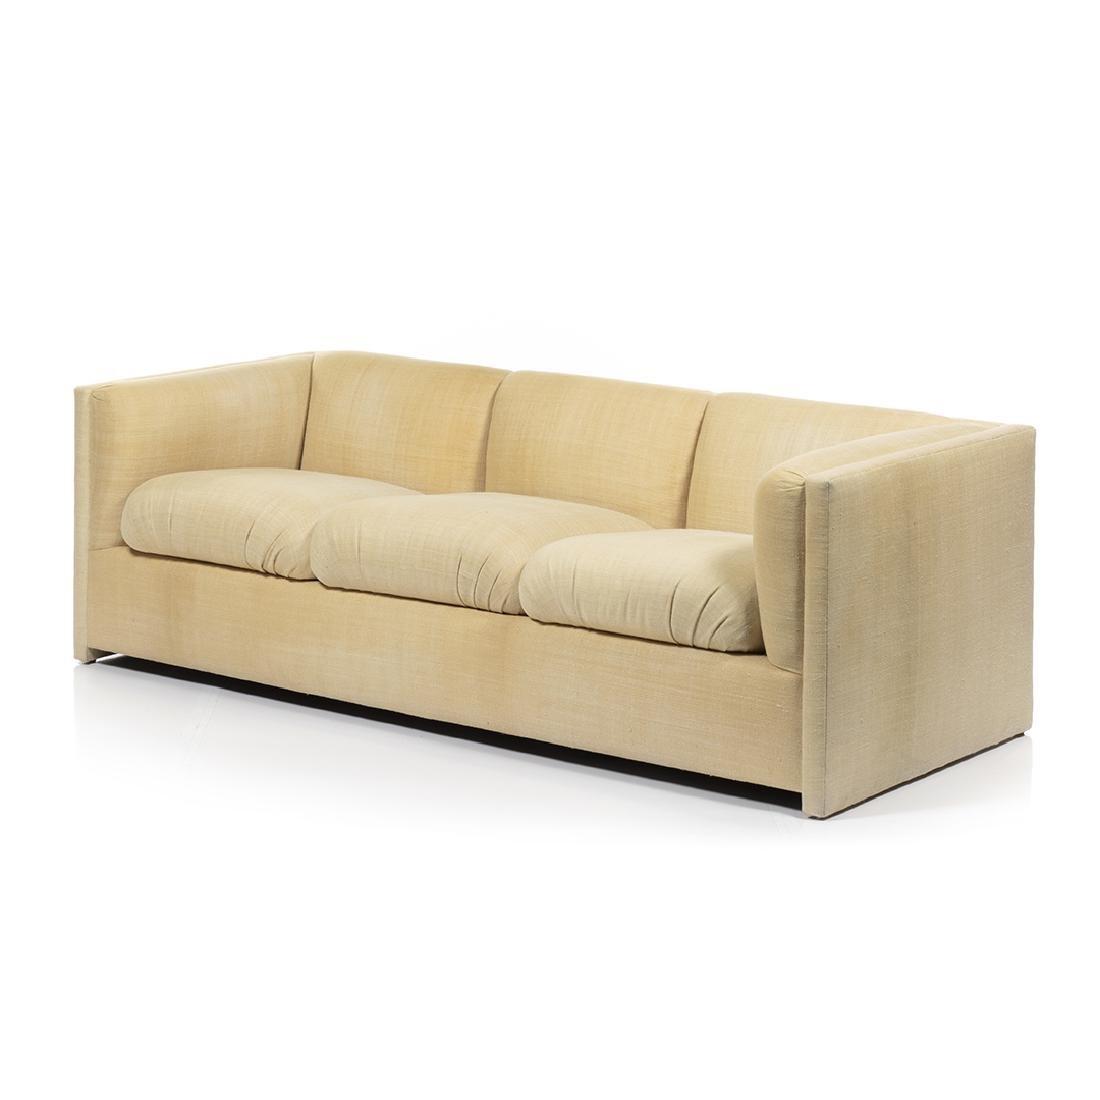 Custom A. Rudin Sofa